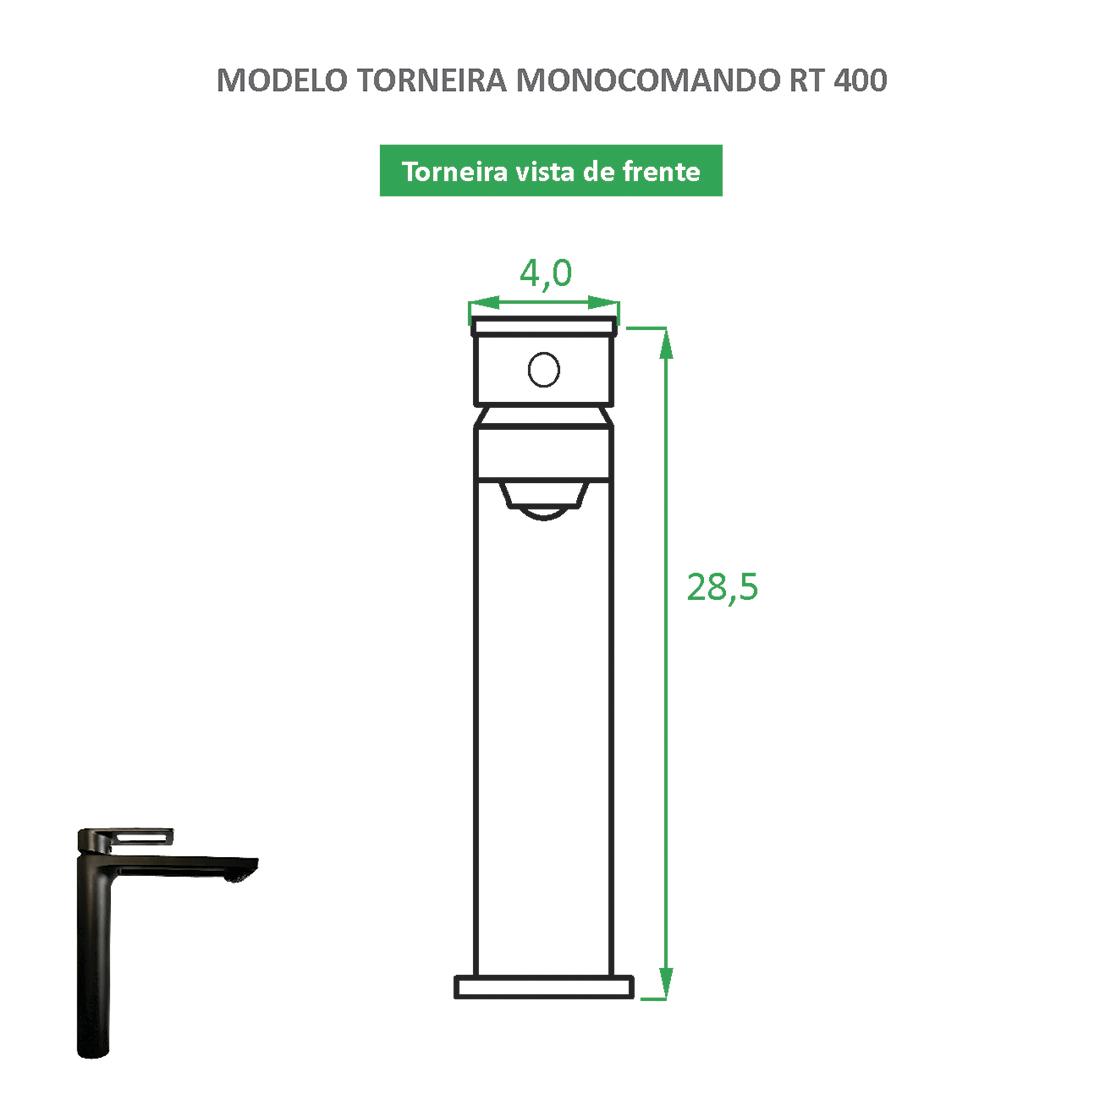 Torneira Monocomando bica alta RT 400 preta fosca